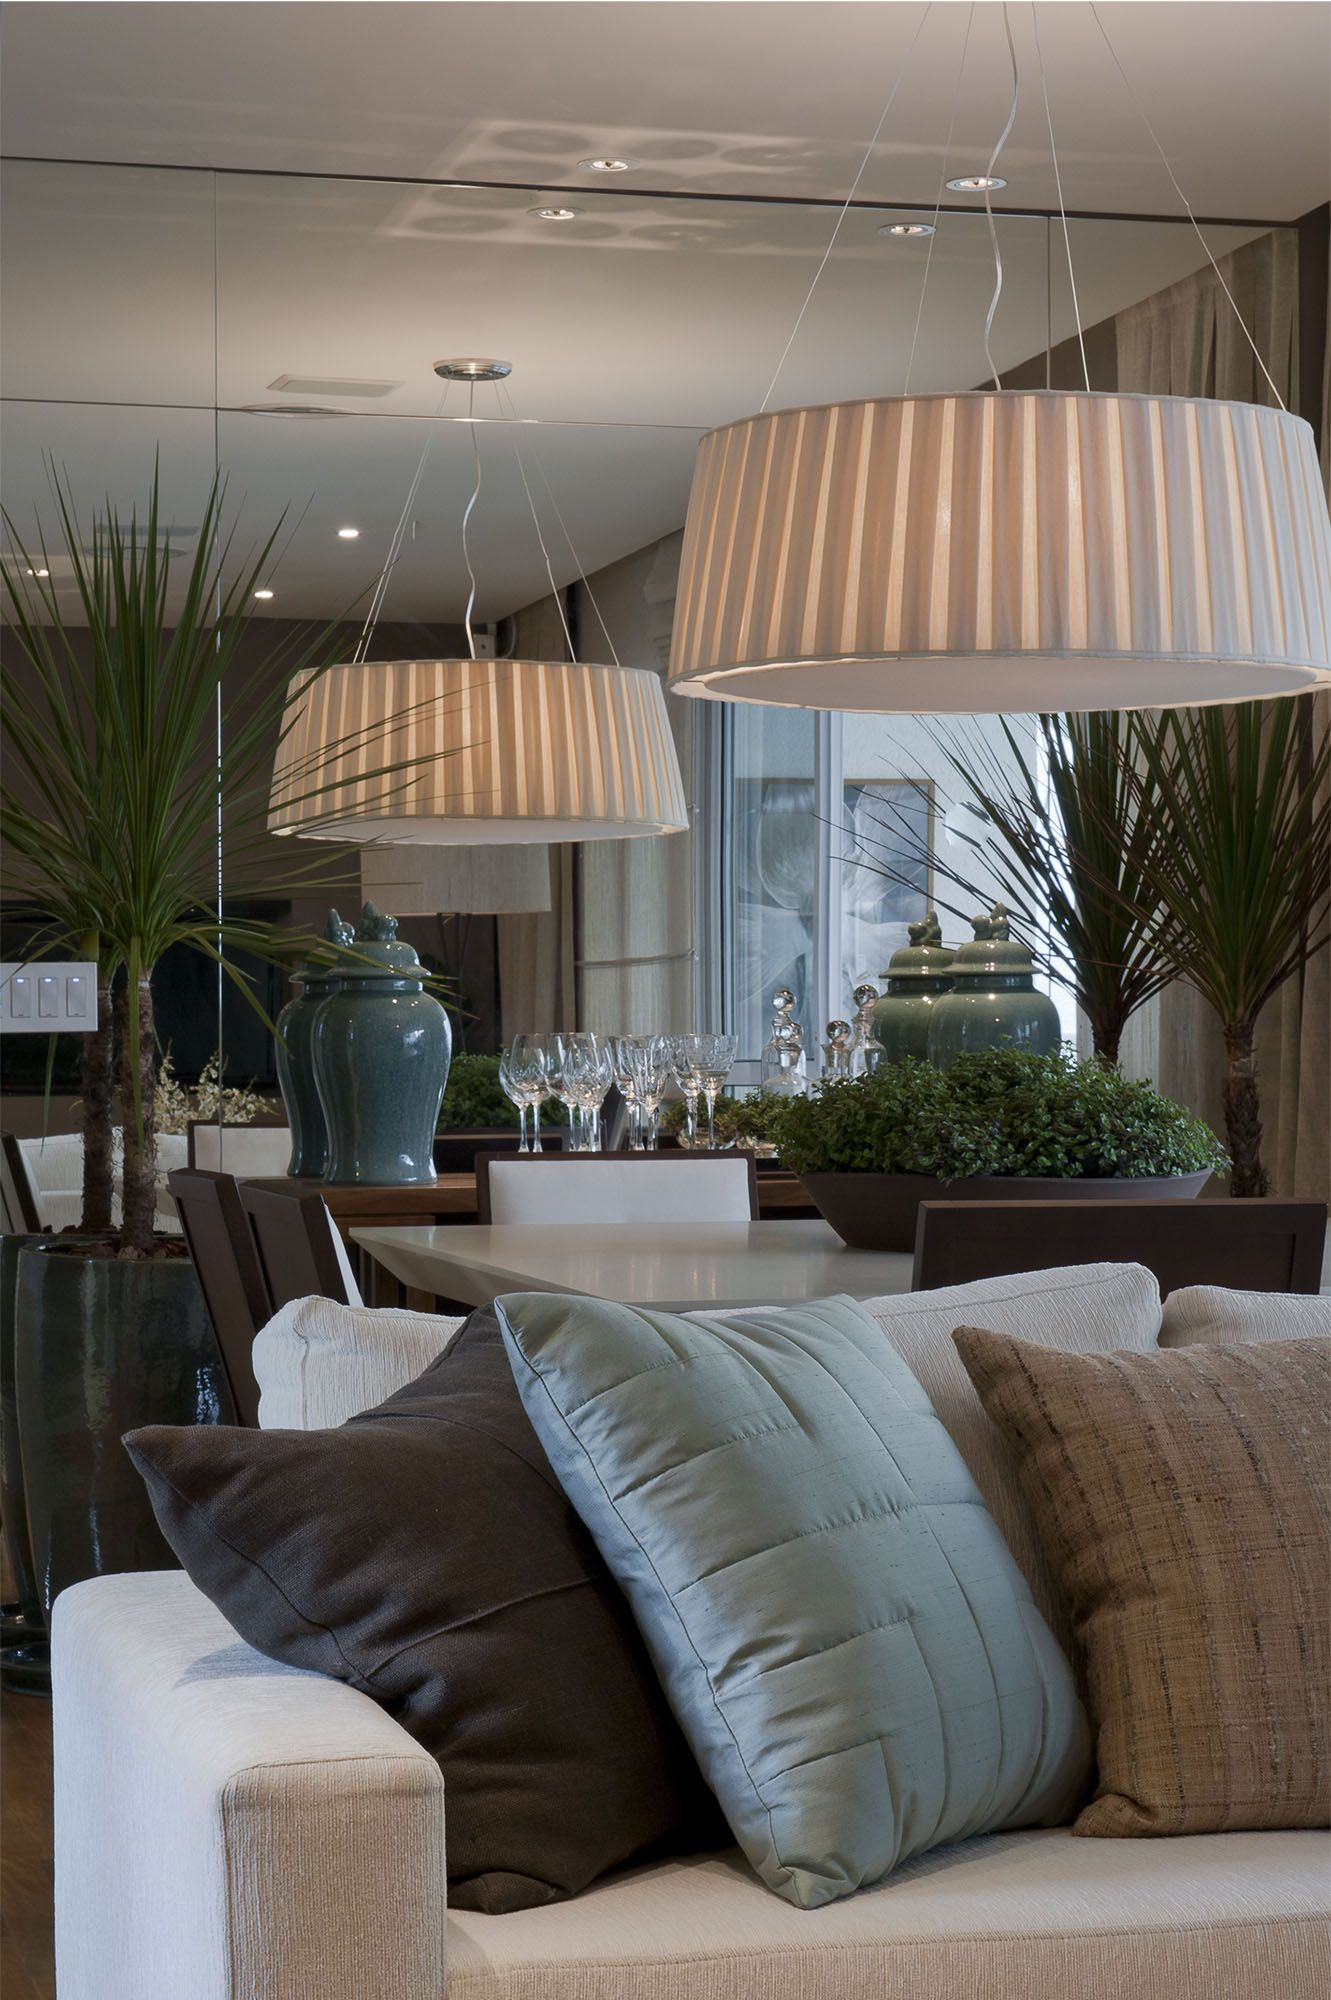 Apartamento foto inspiracjewnętrze pinterest living